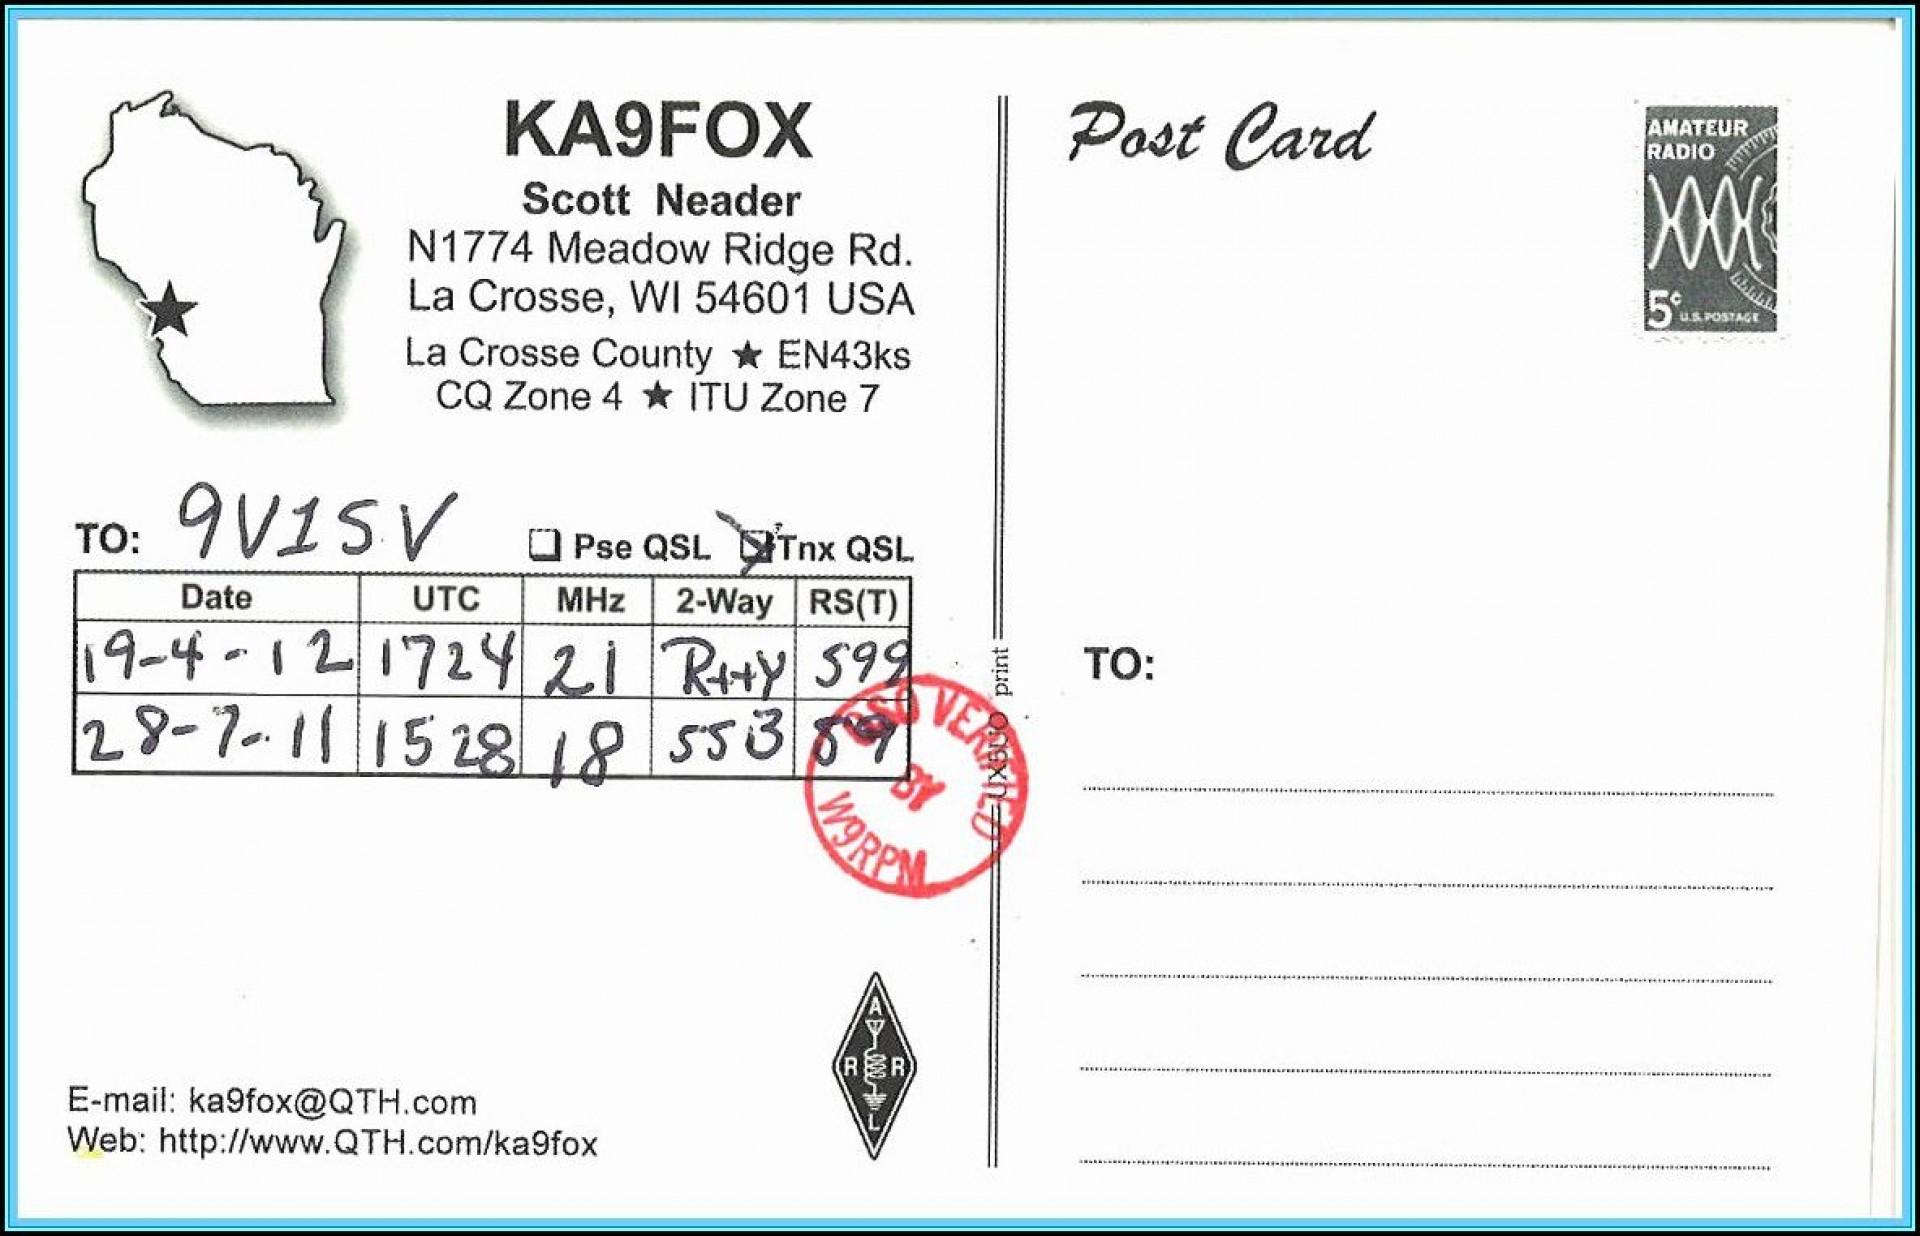 009 Unusual 3x5 Index Card Template For Mac Idea 1920